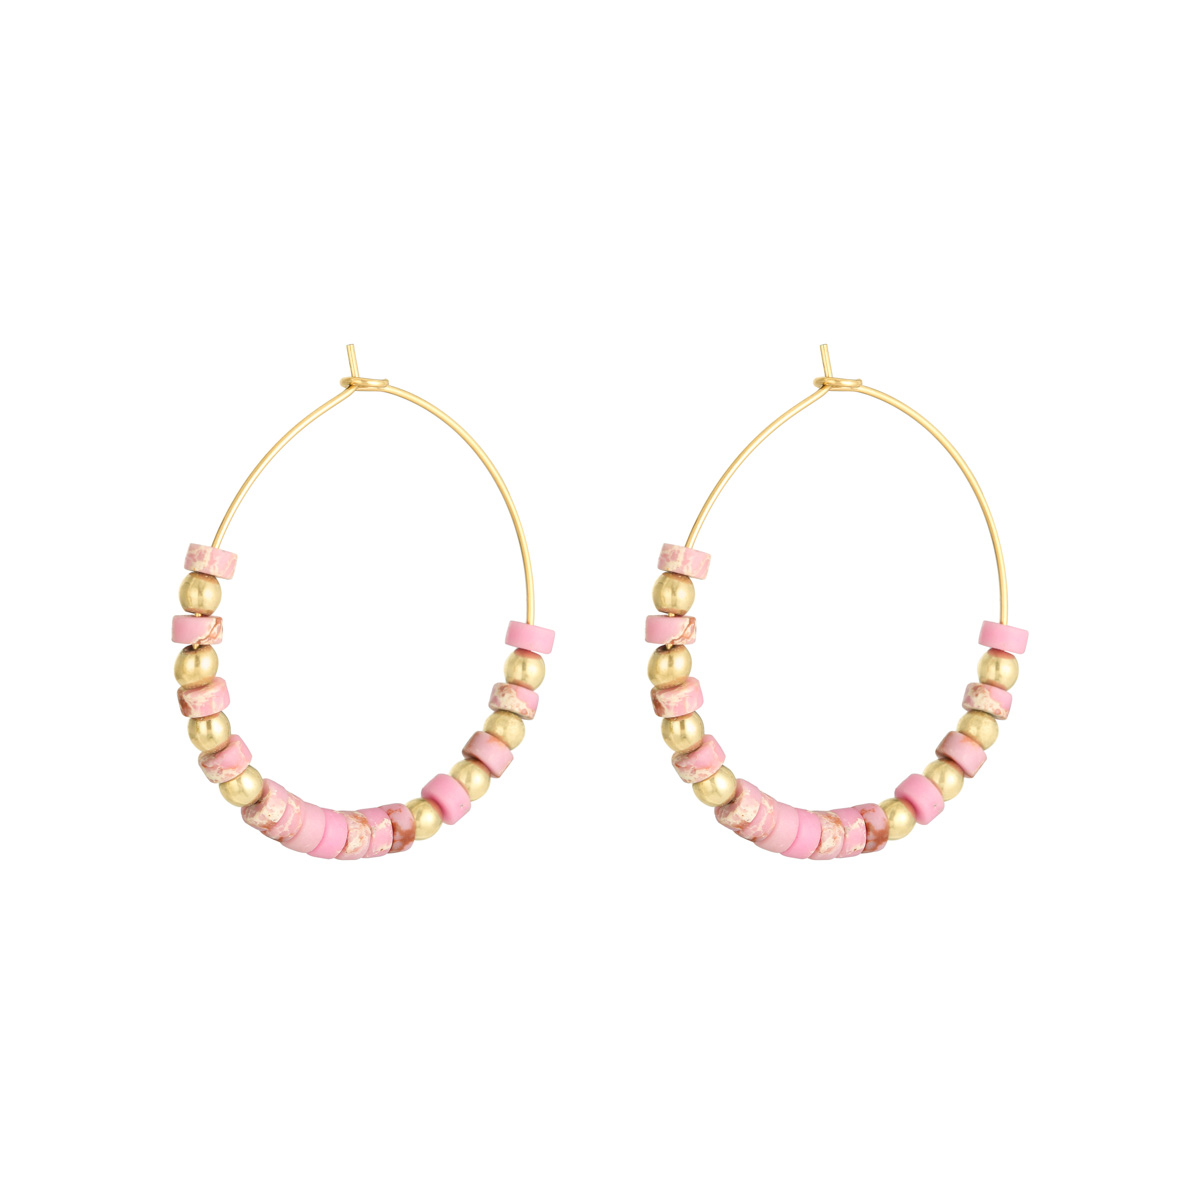 Earrings Beaded Hoops Gold